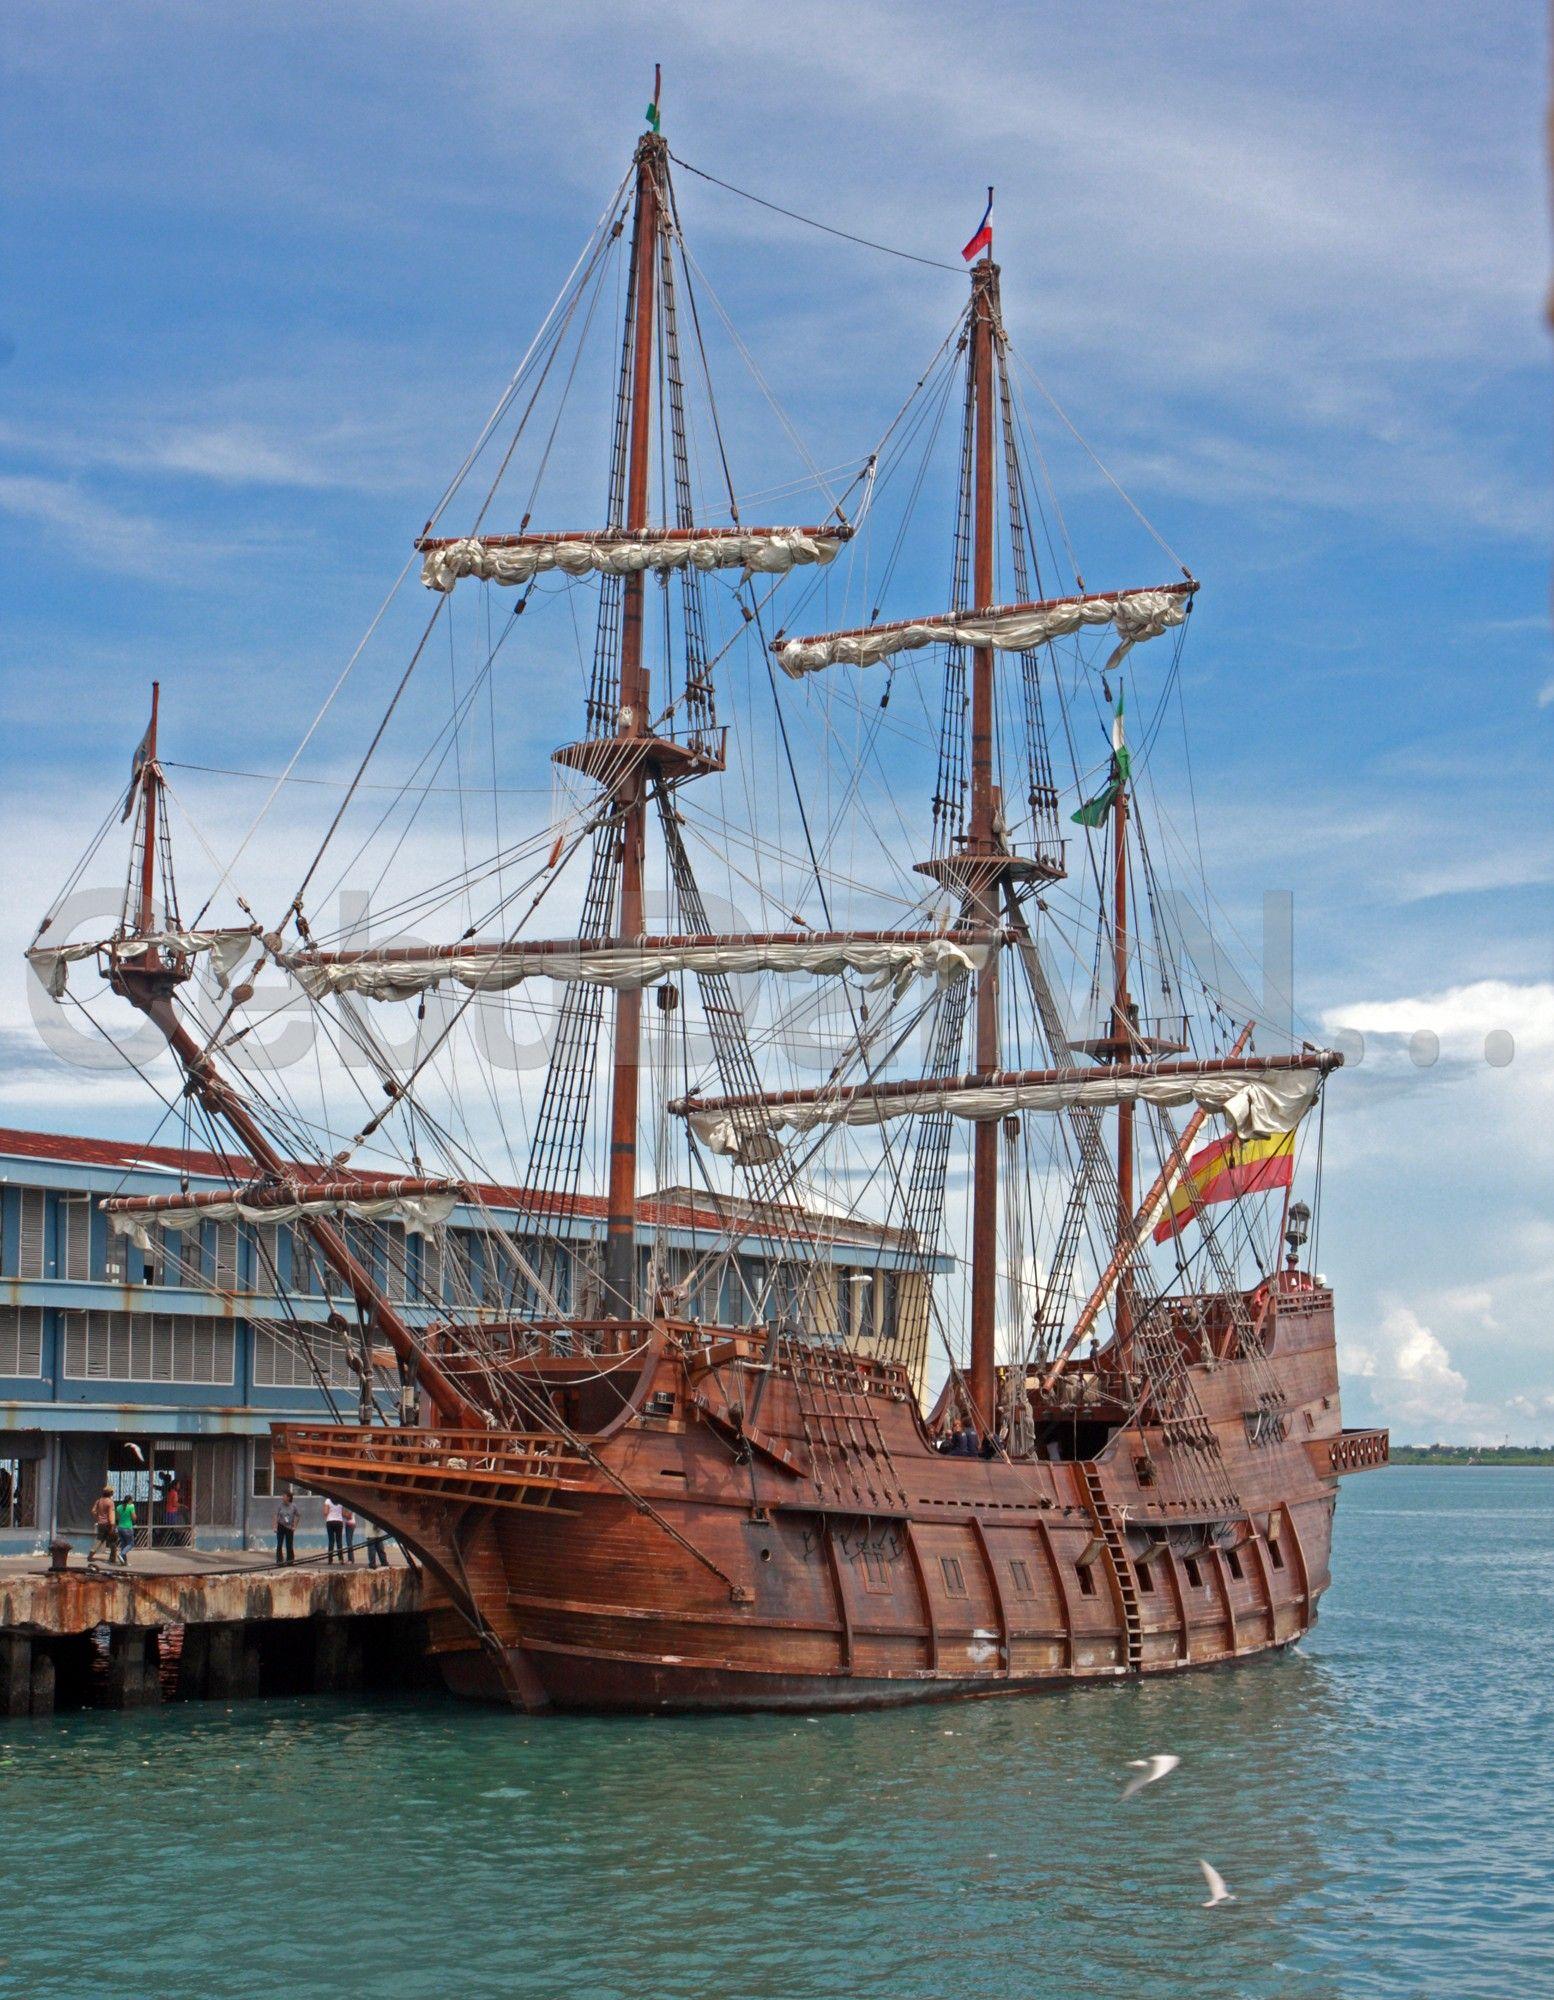 Spanish galleon docks in Cebu port | Ships | Ship, Spanish galleon